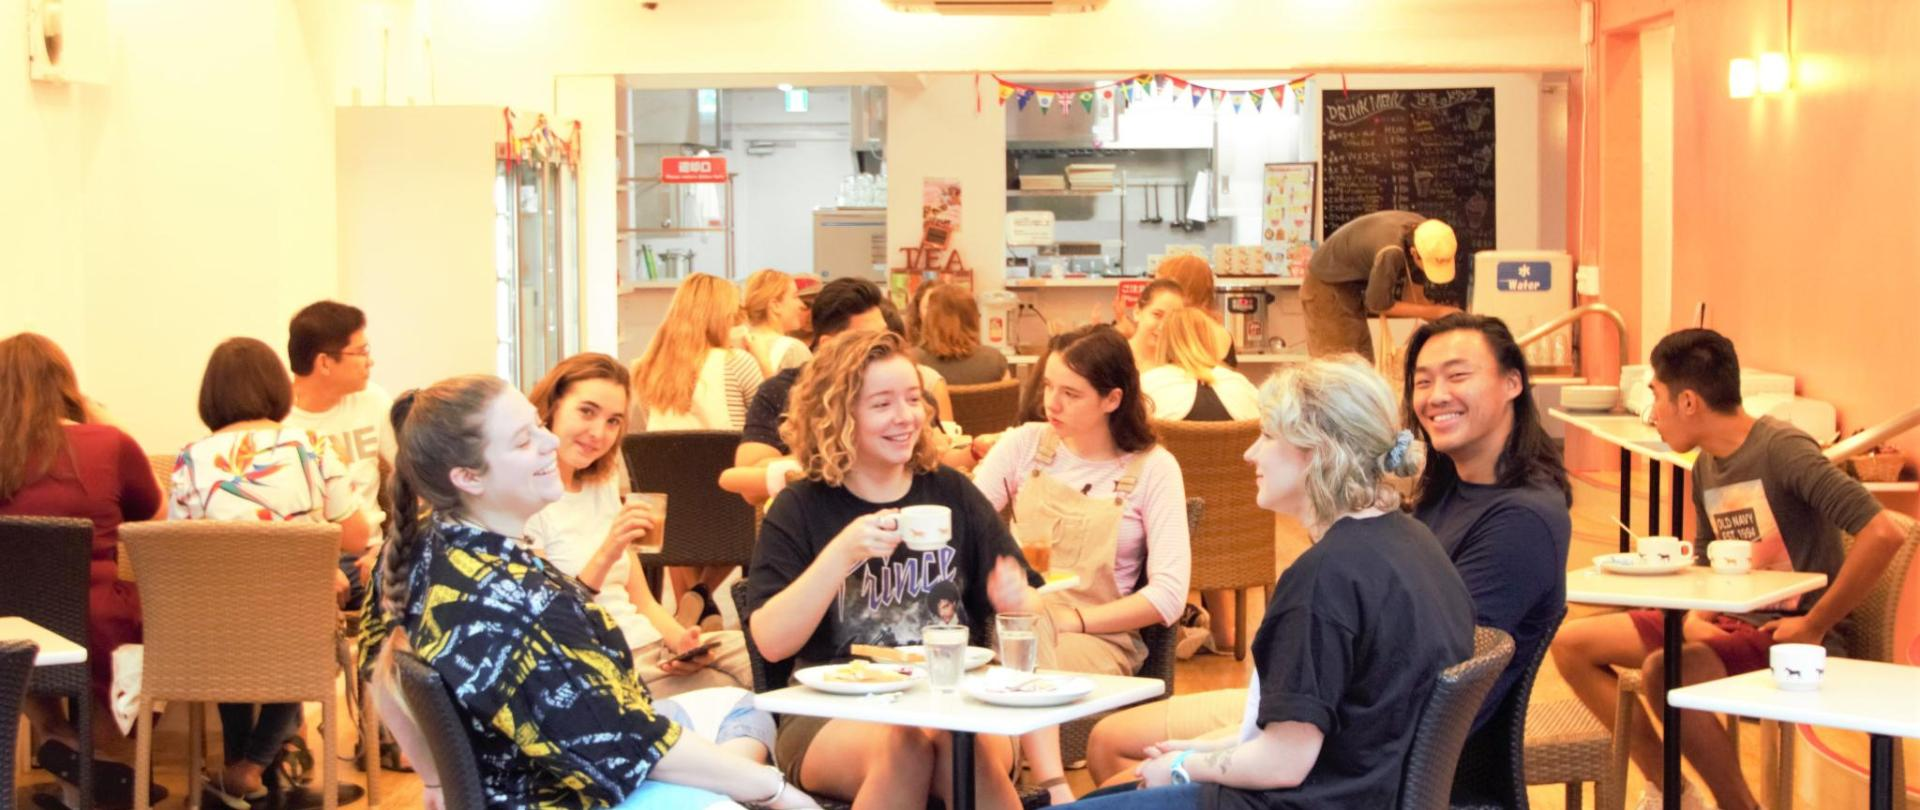 cafe_guests.jpg